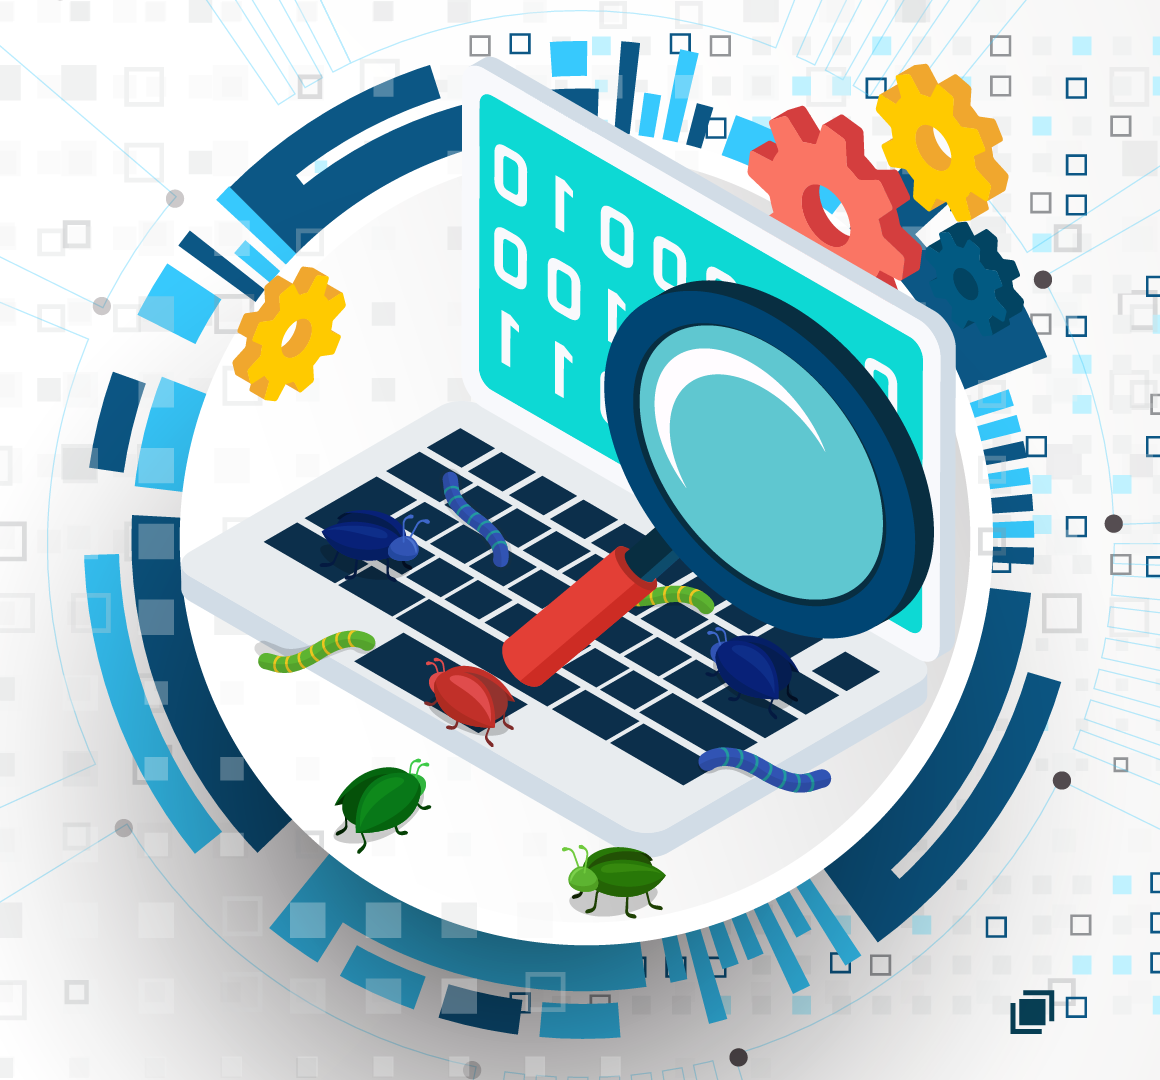 Cyber clipart expert An Security Information CyberTraining 365